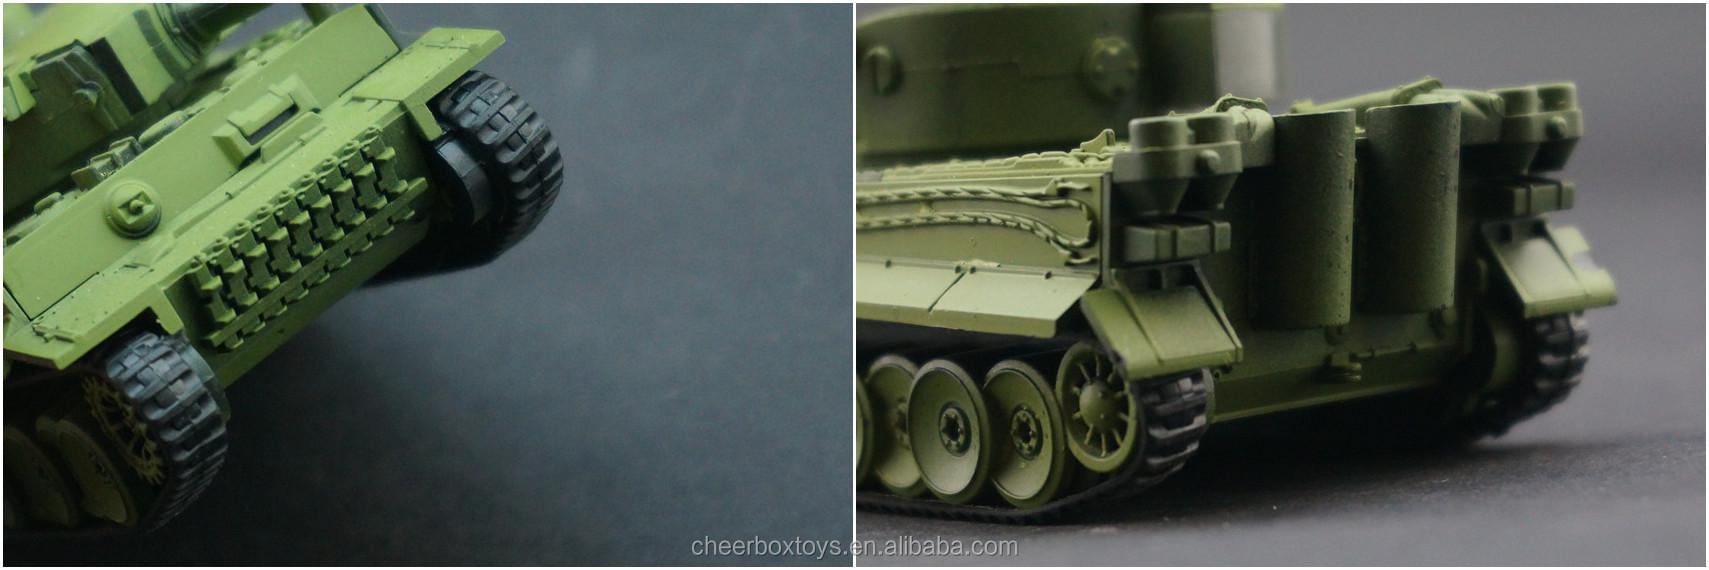 World War II Tank Model Plastic Assemble Kit 1:72 Military Model